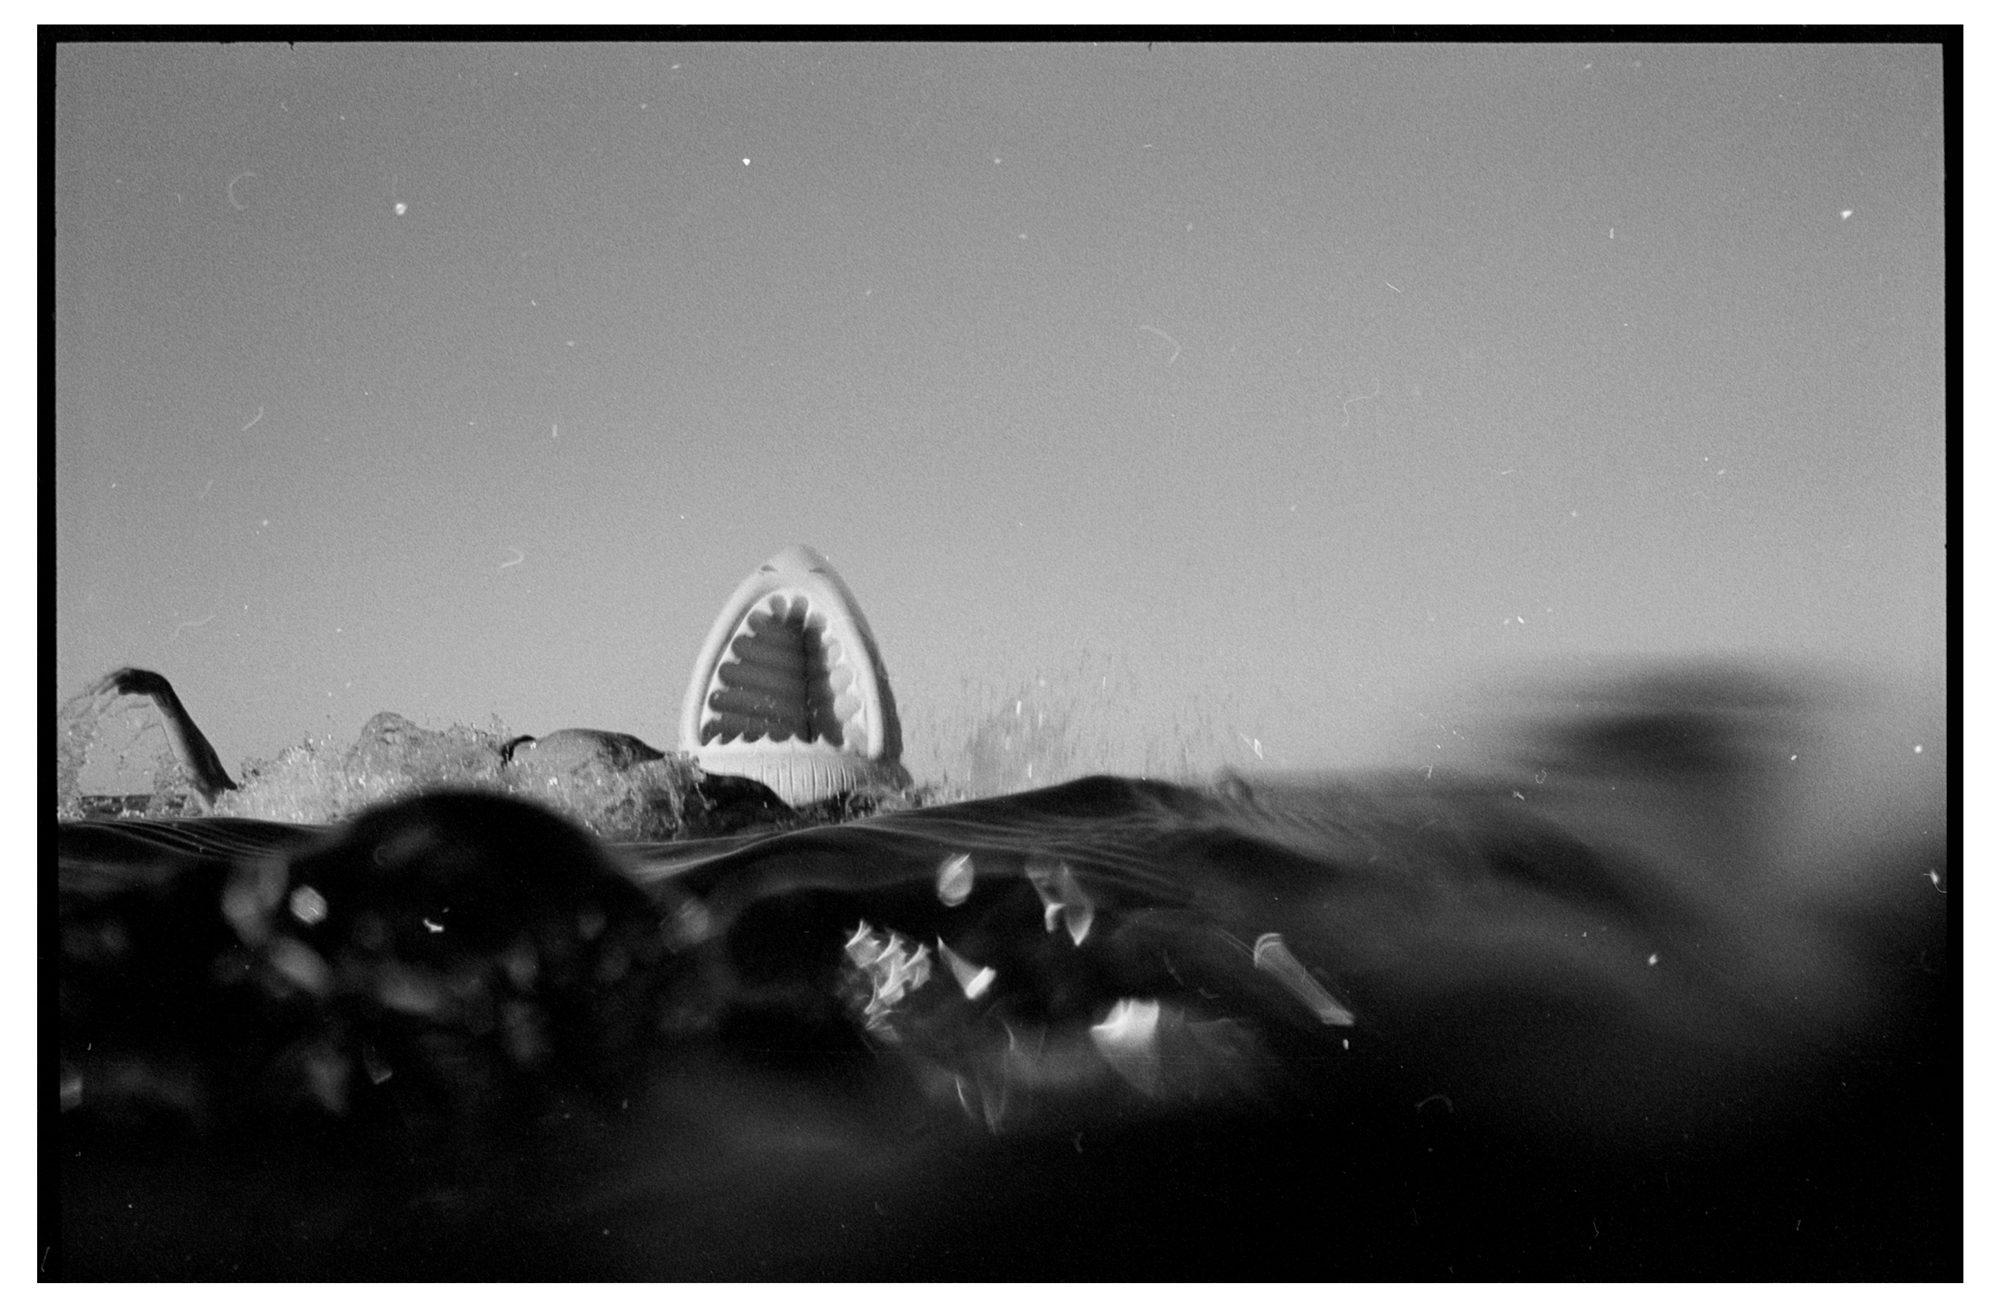 Shark by Brett Hillyard on ILFORD black and white HP5+ Film